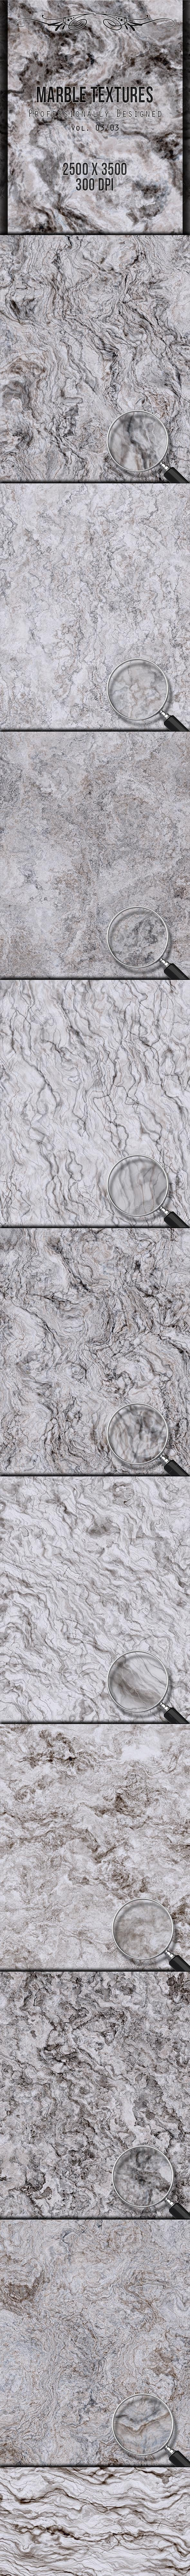 Marble Textures Premium 03 - Stone Textures